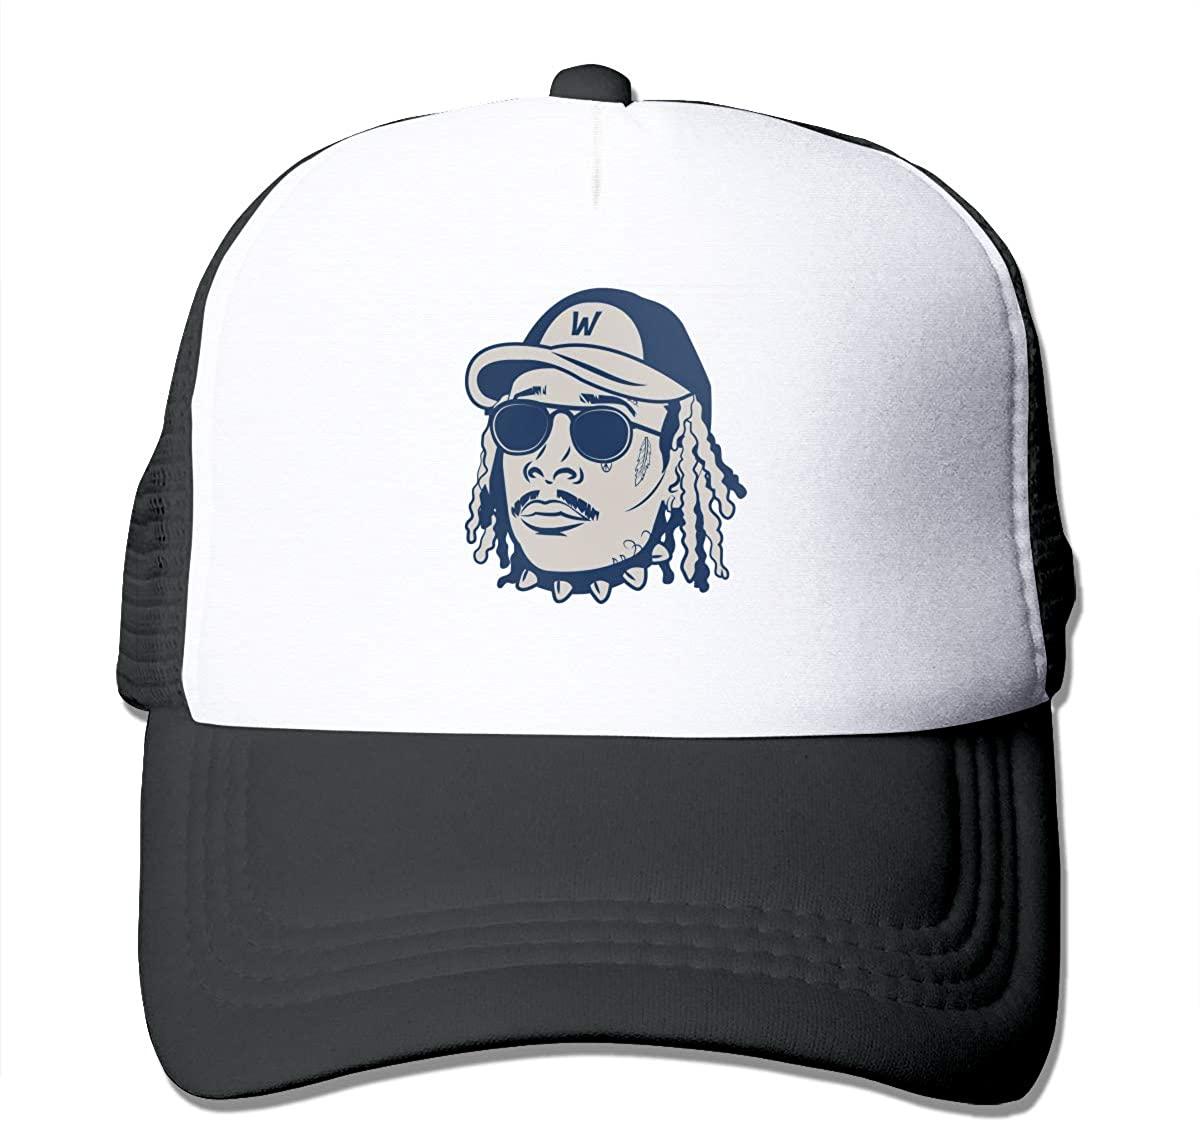 Shanke Fashion Wiz Khalifa Logo Trucker Hat Adjustable Outdoors Sports Mesh Snapback Baseball Cap